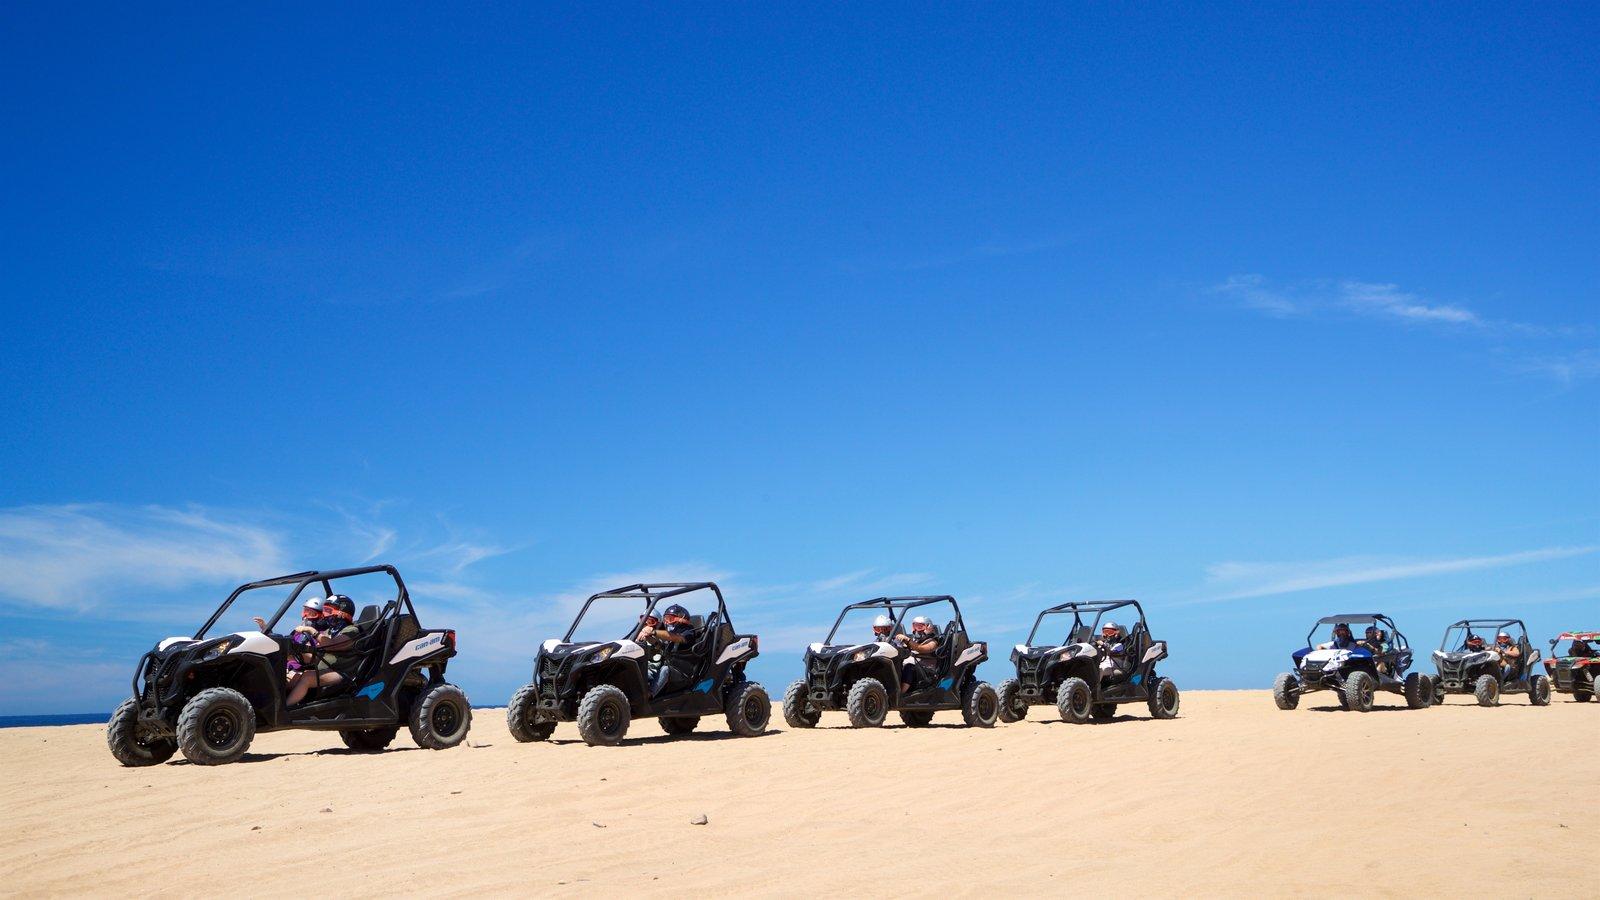 Migrino showing general coastal views, a beach and 4 wheel driving